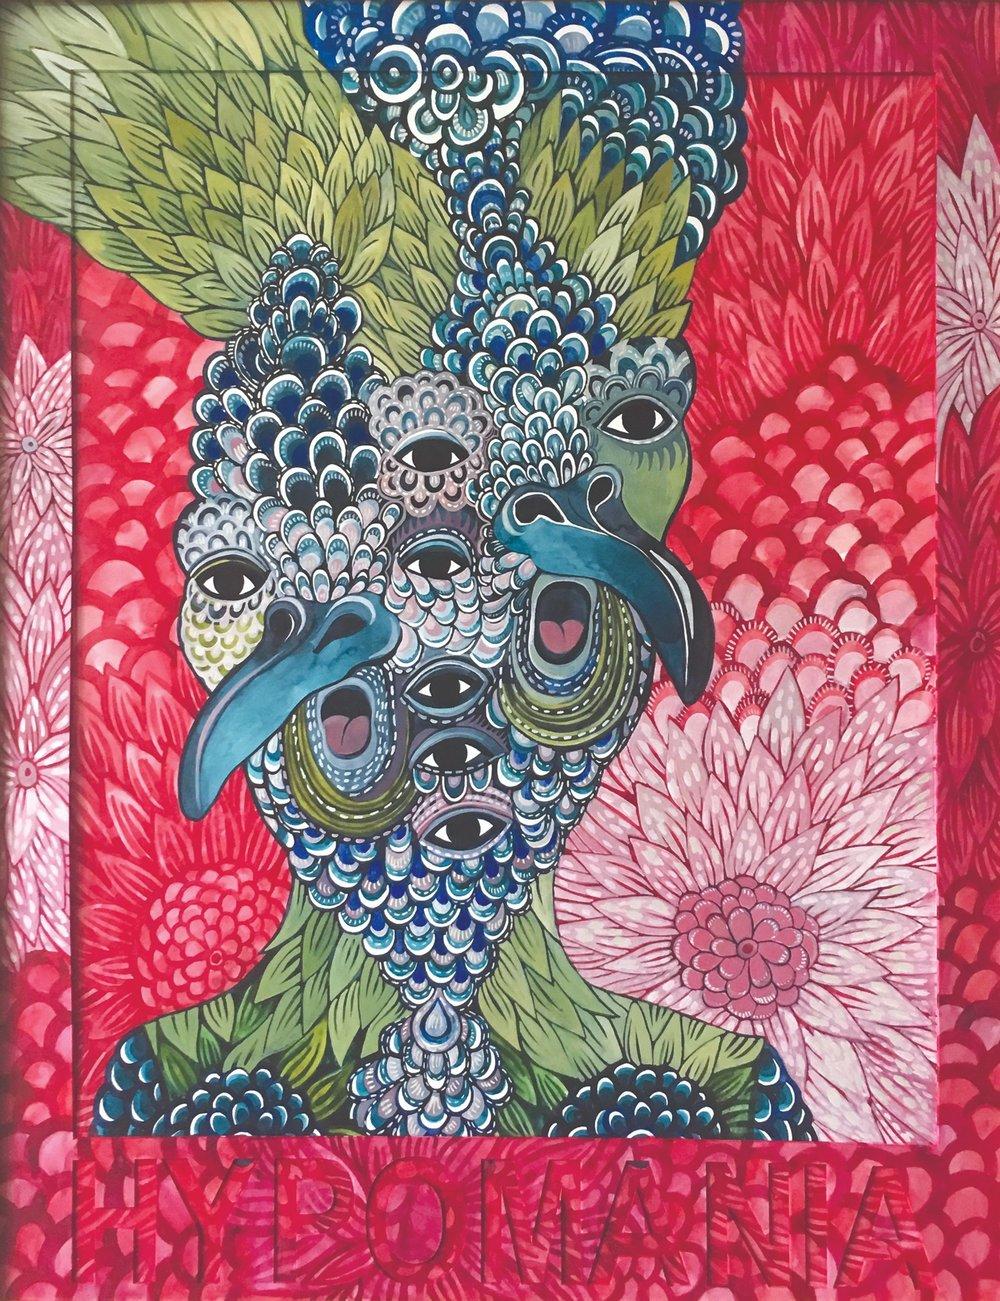 CECILIA FOGELBERG  HYPOMANIA , 2019 gouache and watercolour on 100% cotton rag board, framed 87 x 68 cm